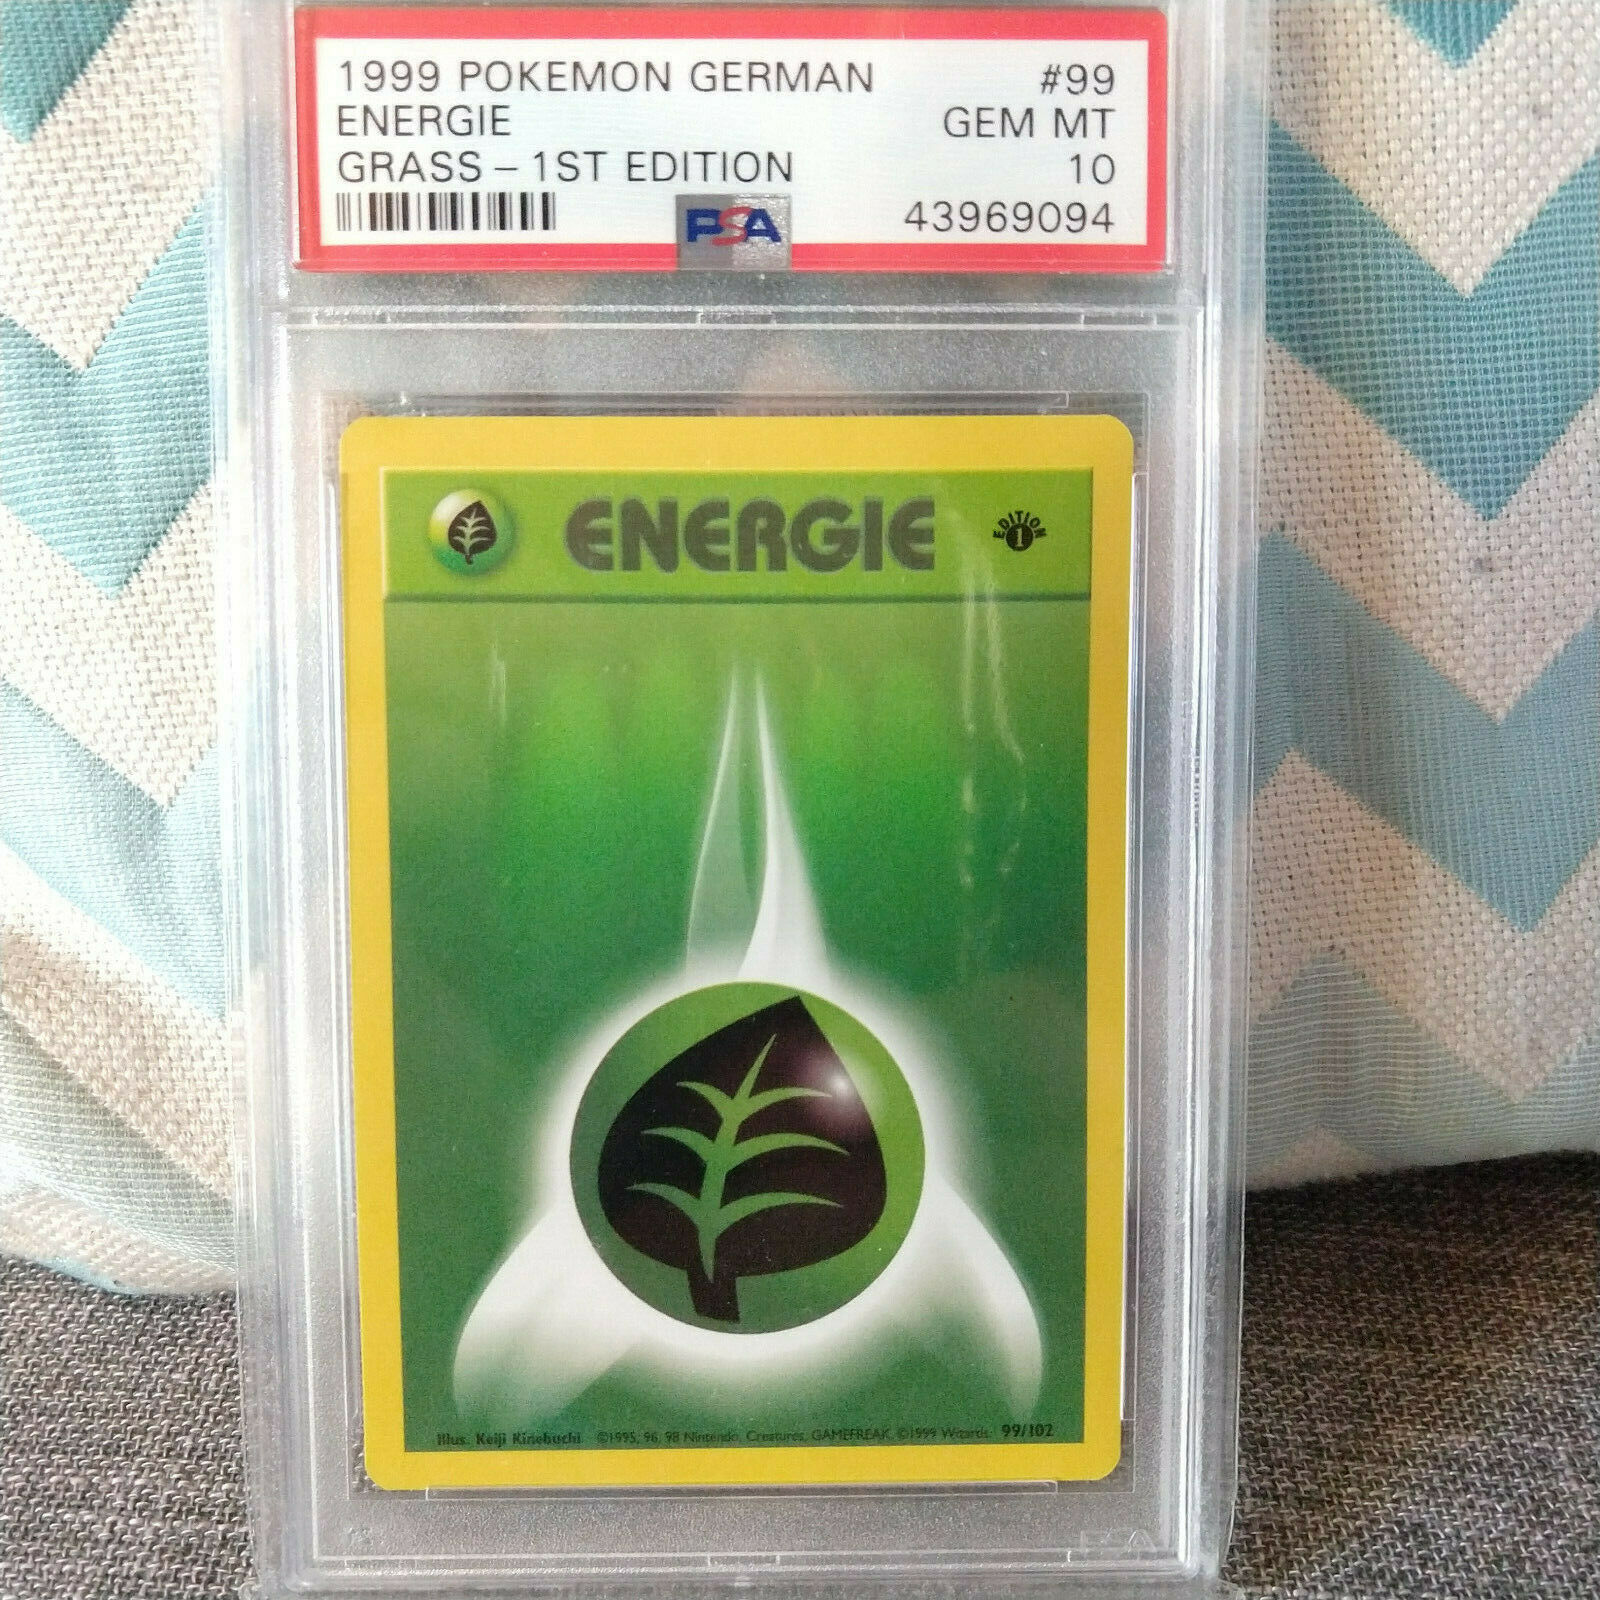 Pokemon Energie Energy Edition 1 Gras grass PSA 10 GEM MINT